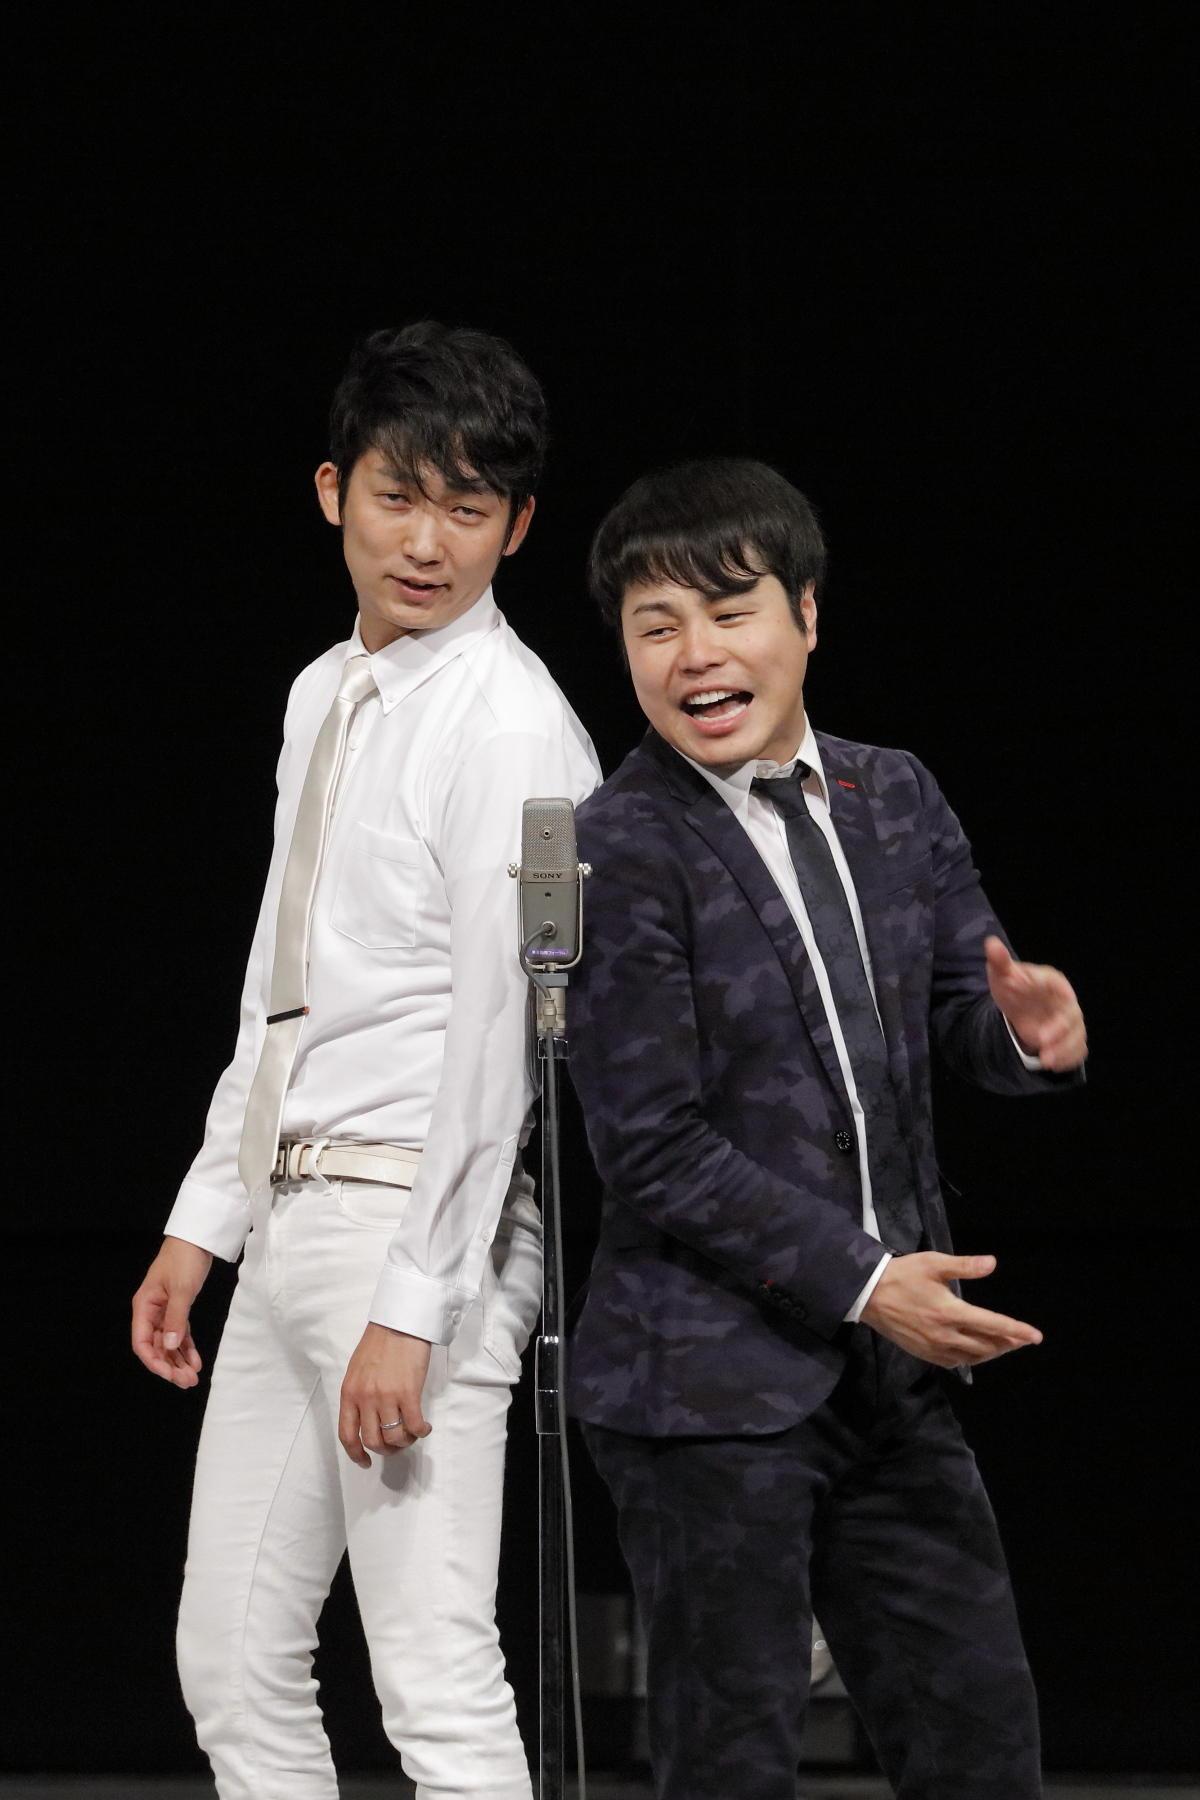 http://news.yoshimoto.co.jp/20171112124716-f2e32f1a1217586ff8949ddf2cdadf8e86731455.jpg